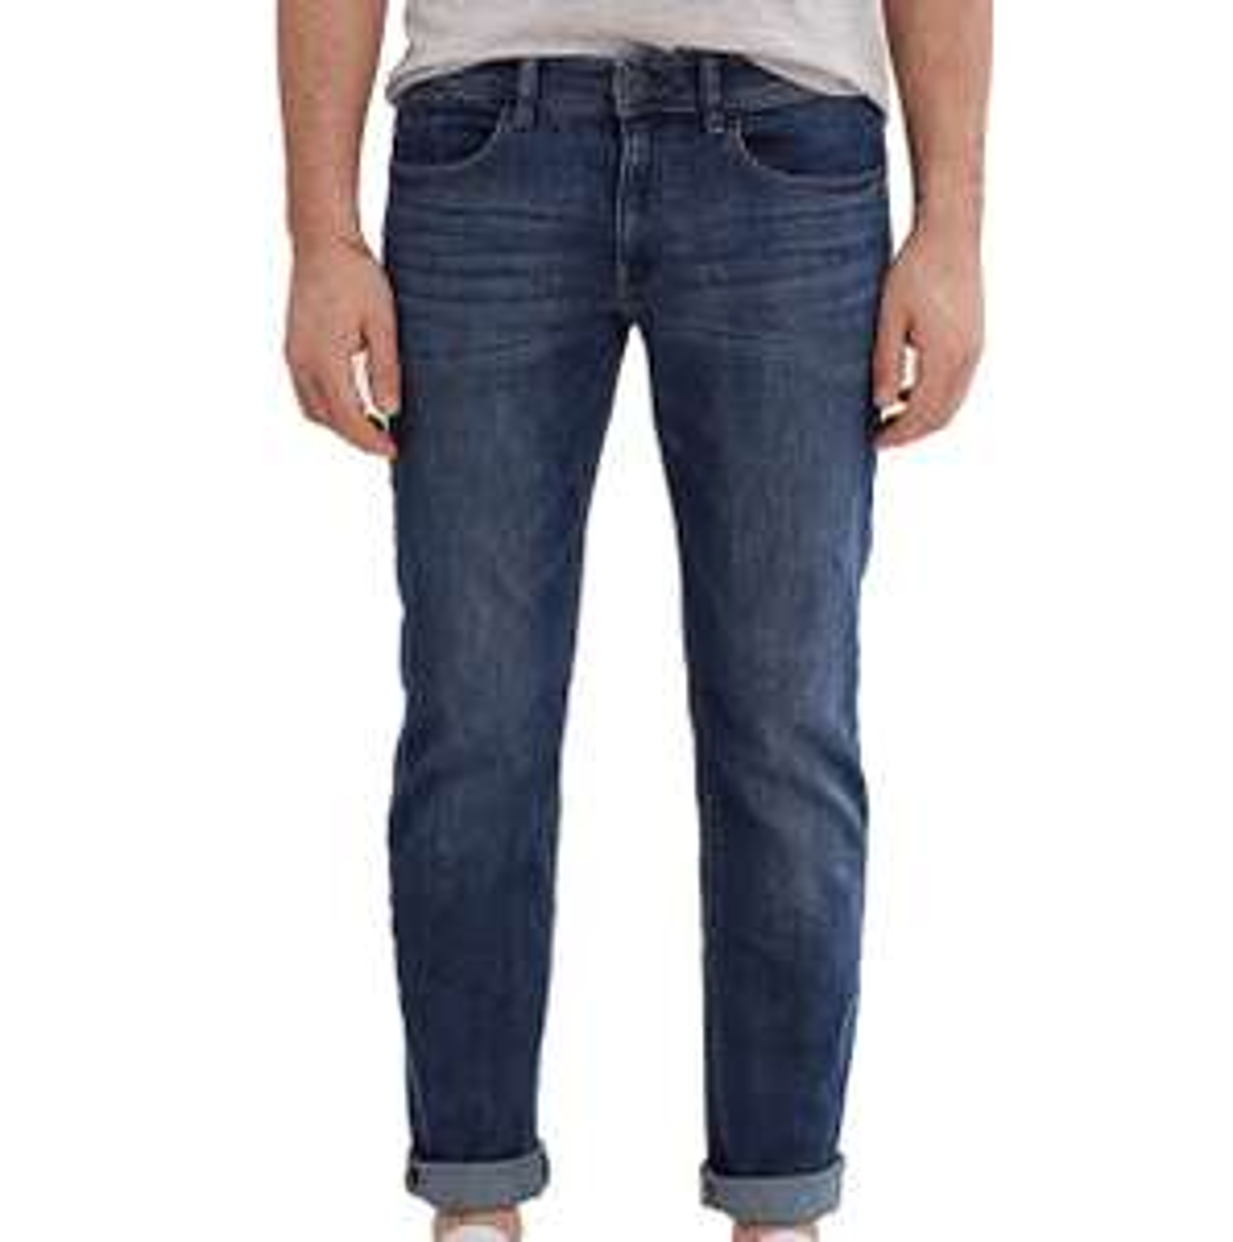 ESPRIT Herren Jeans casual look viele Größen Amazon